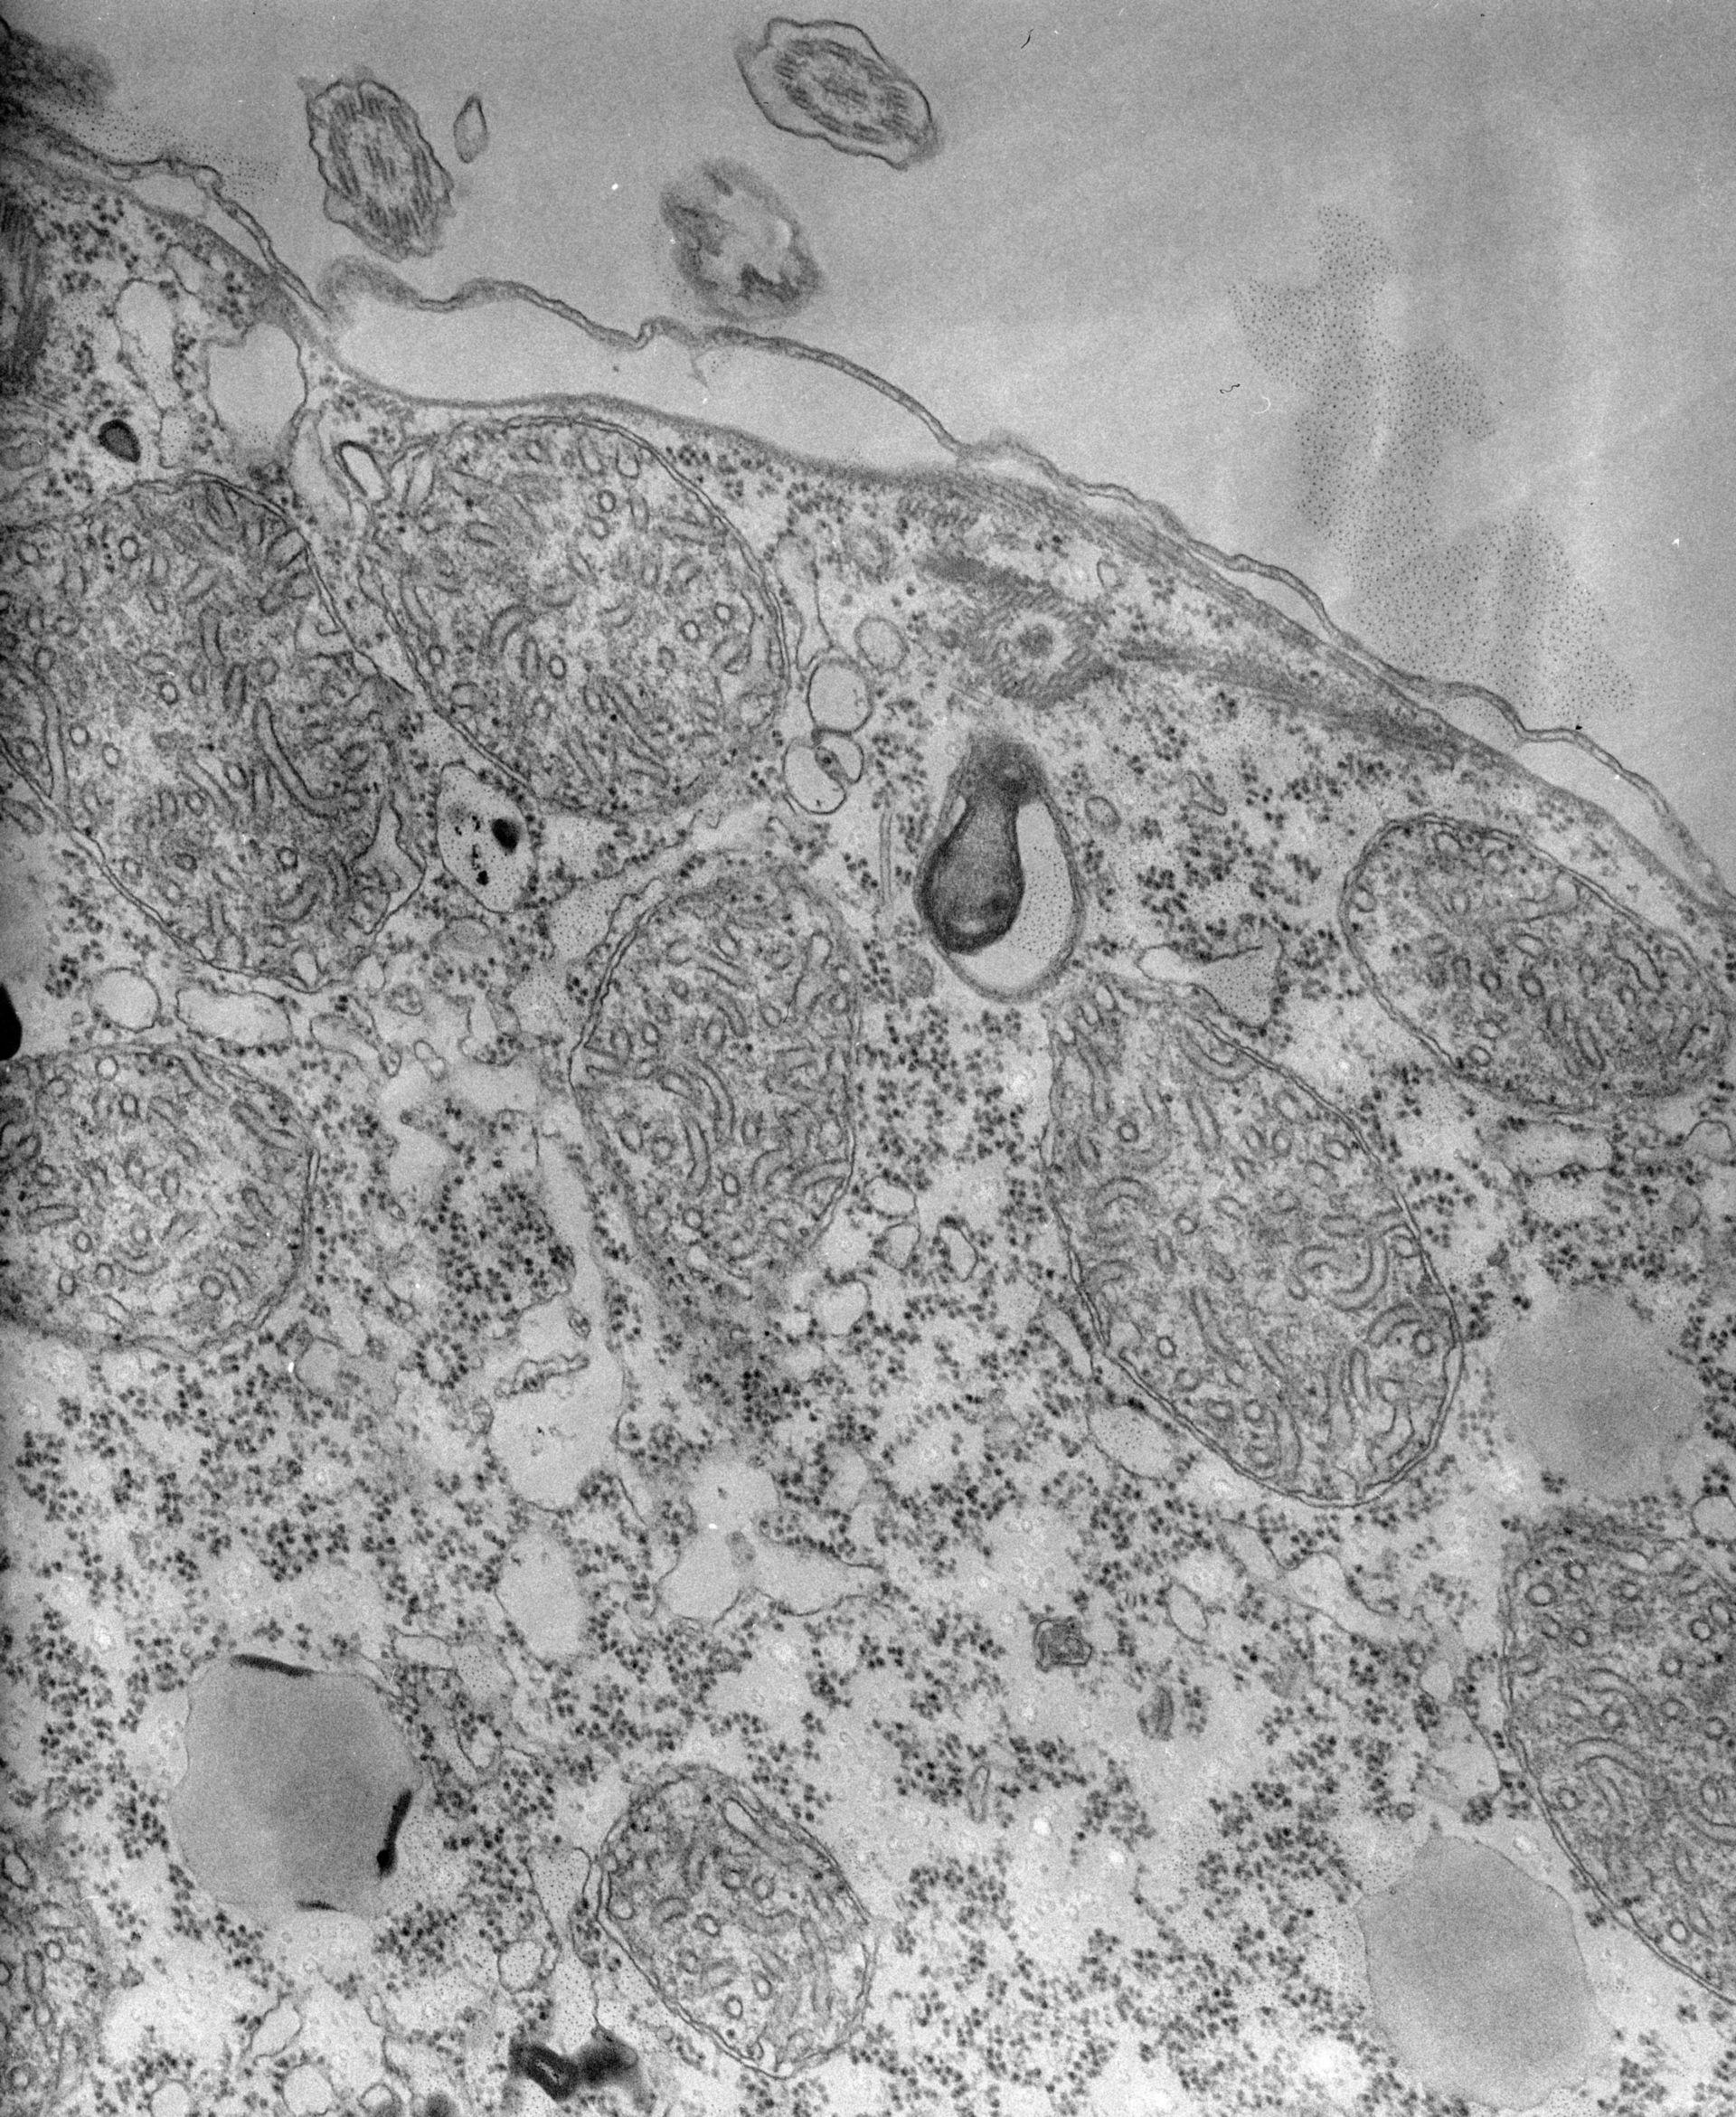 Tetrahymena pyriformis (organelli di membrana) - CIL:39722